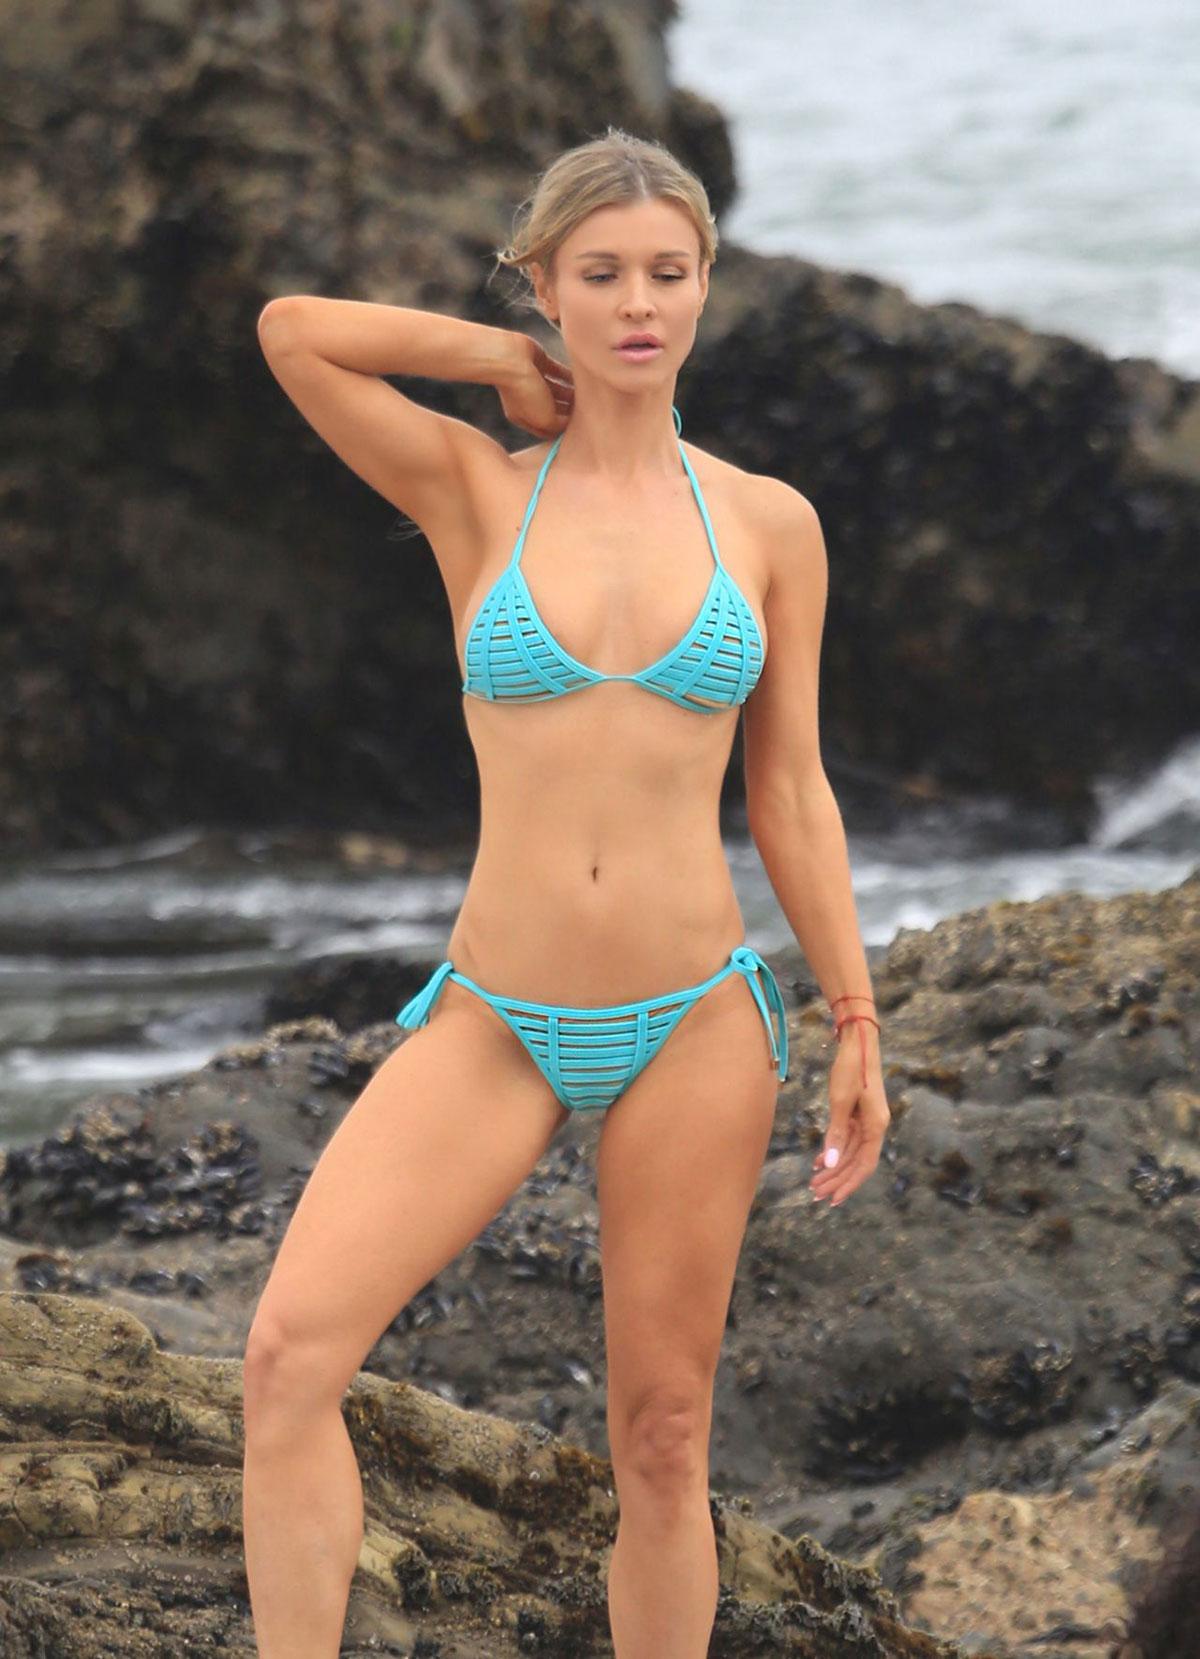 Joanna Krupa Bikini Photoshoot On Mothers Day In Malibu